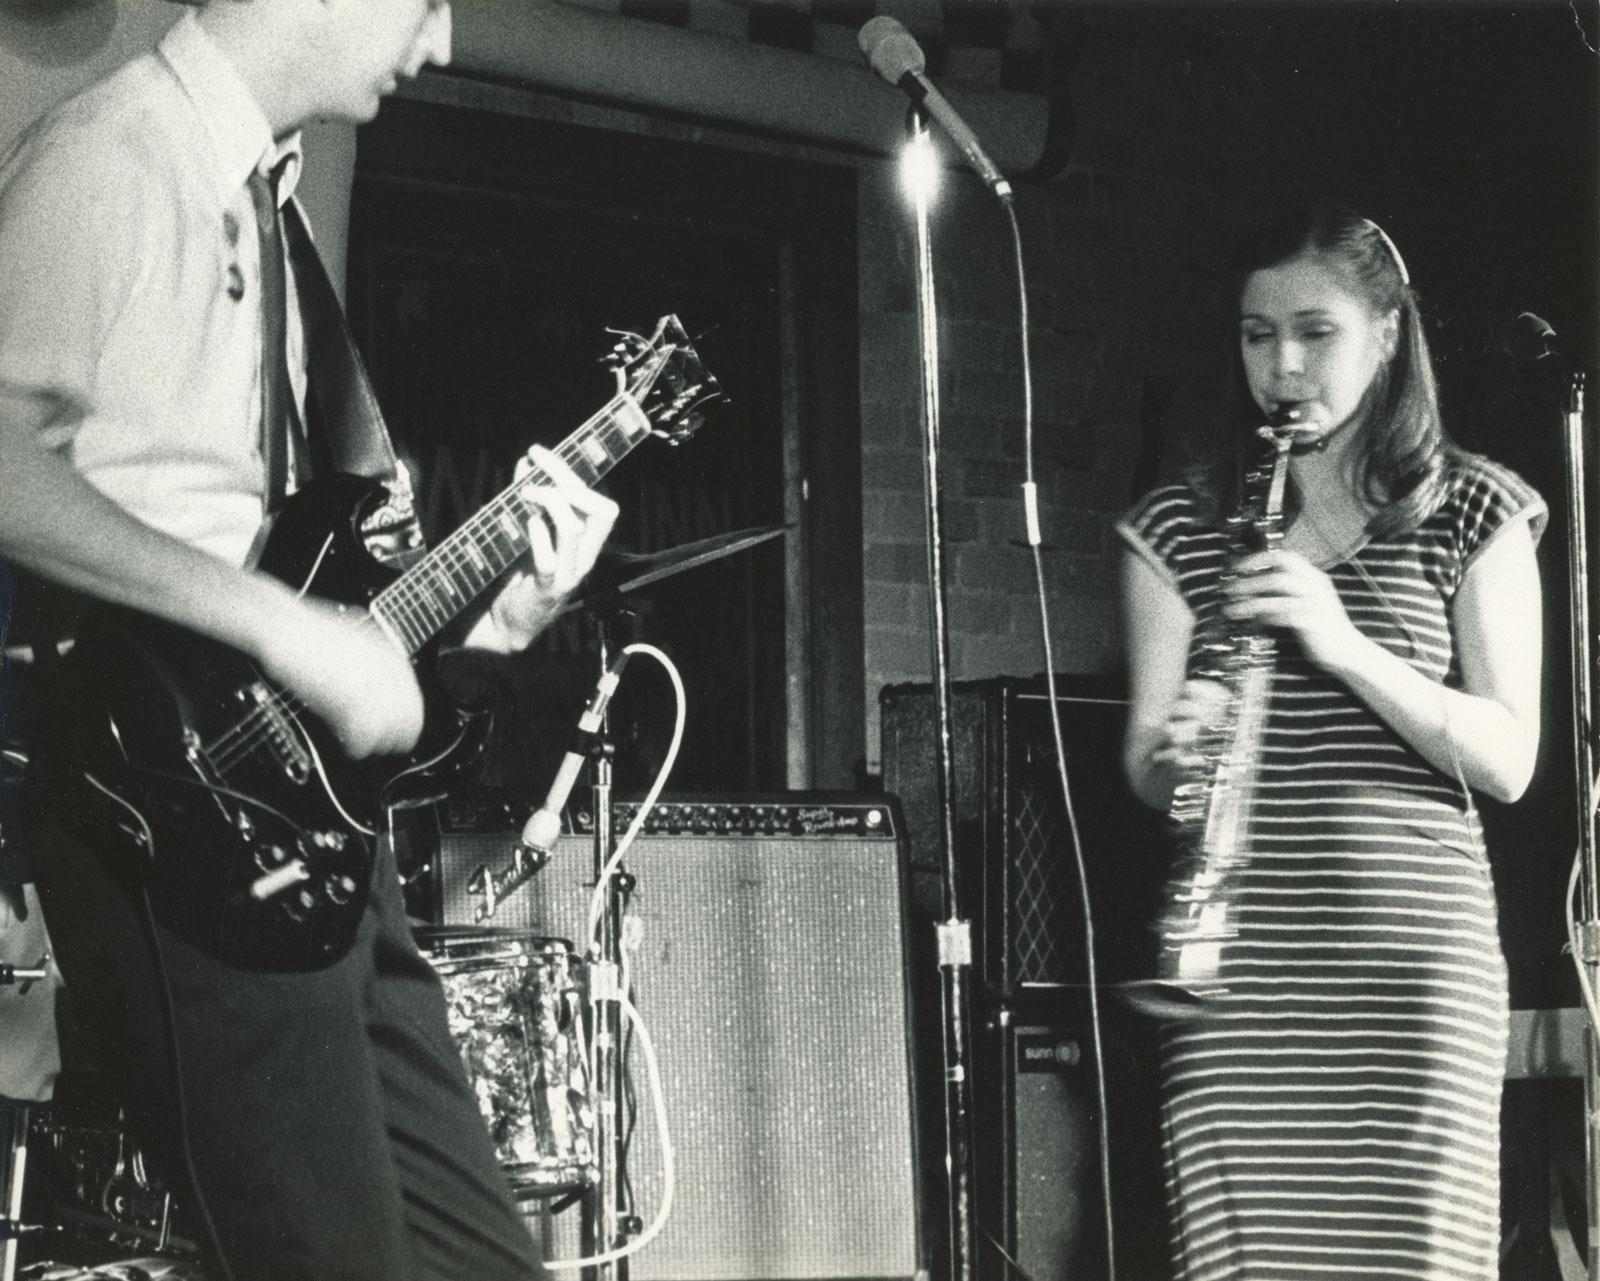 HiTechs' Ned Hoskin - guitar and Peggi Fournier - soprano saxophone, 1980